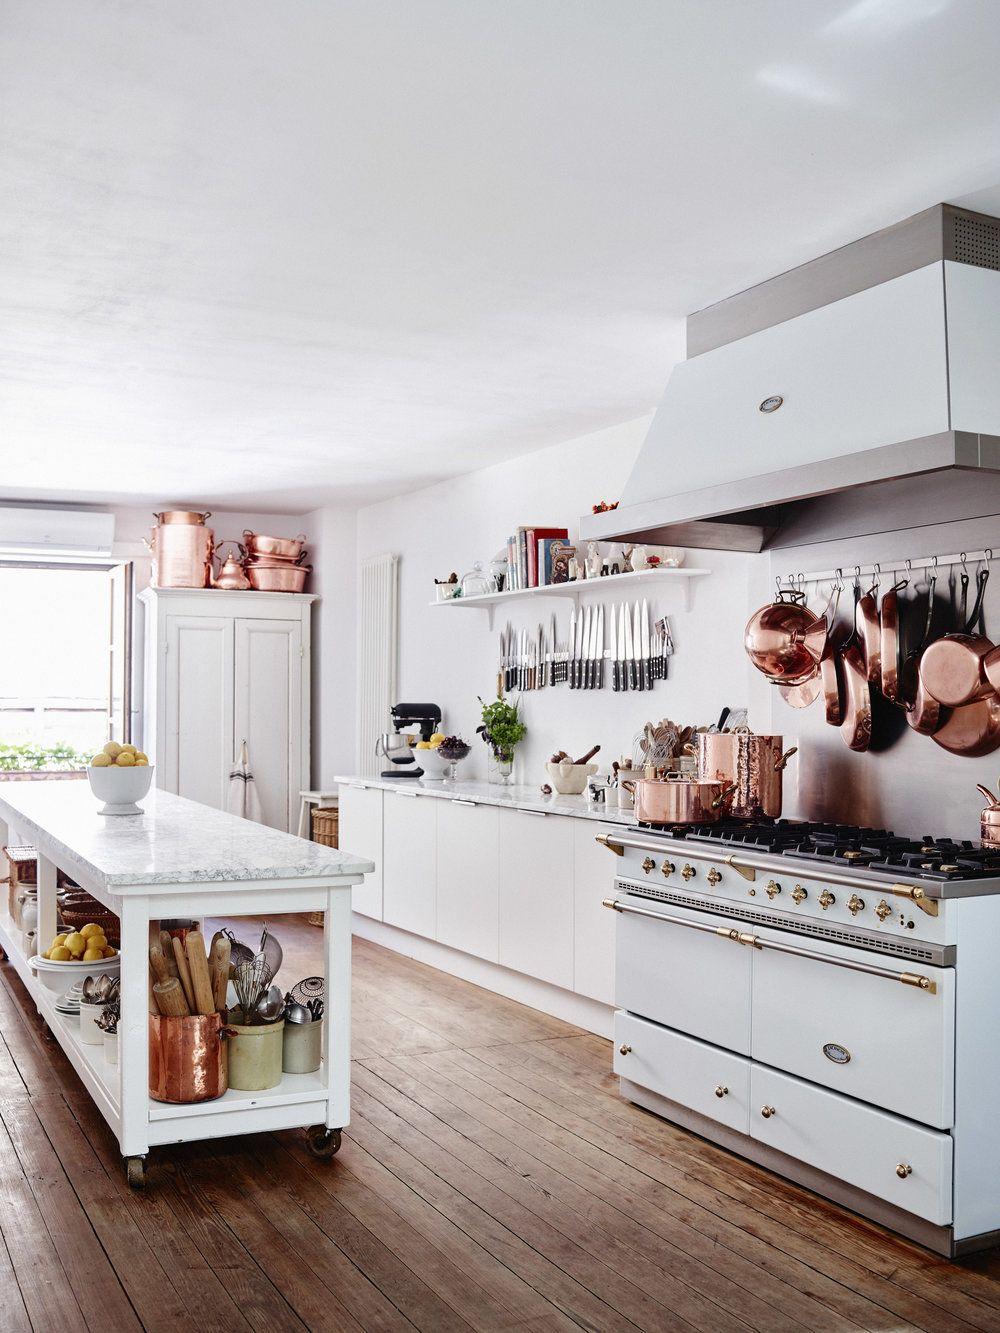 Cooking School Kitchen French Kitchen Inspiration Kitchen Style